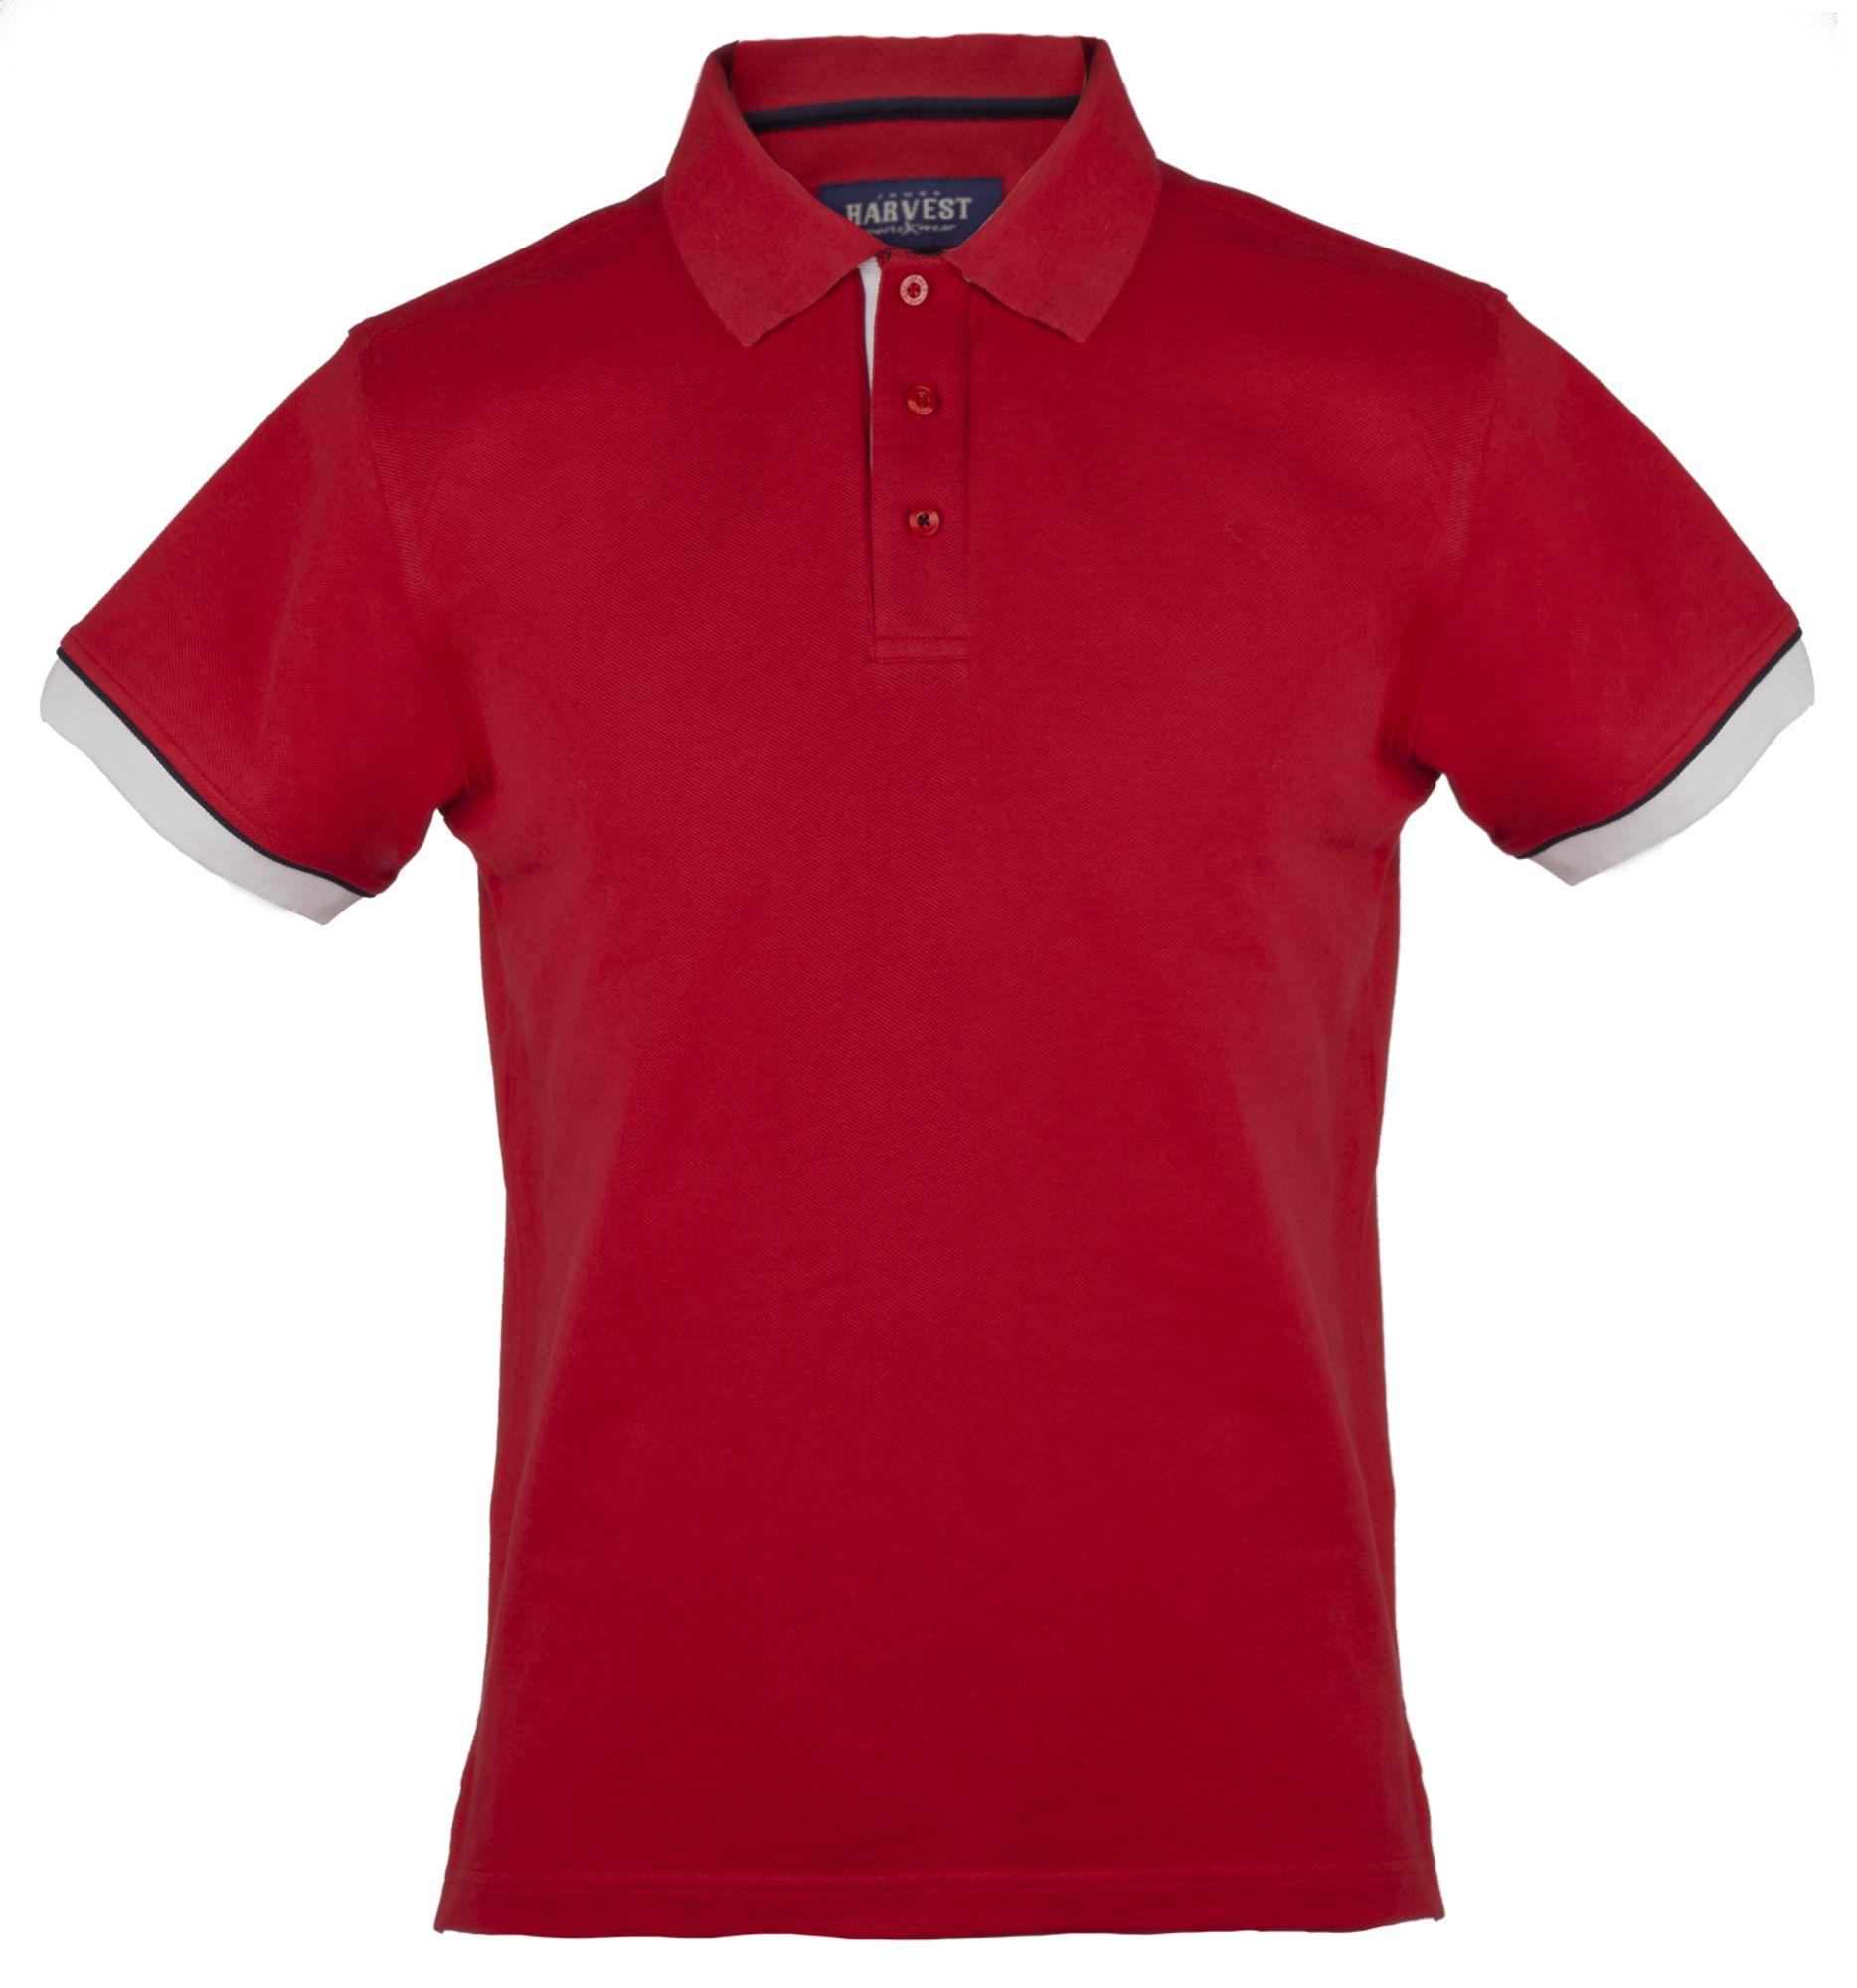 Рубашка поло мужская ANDERSON, красная с белым